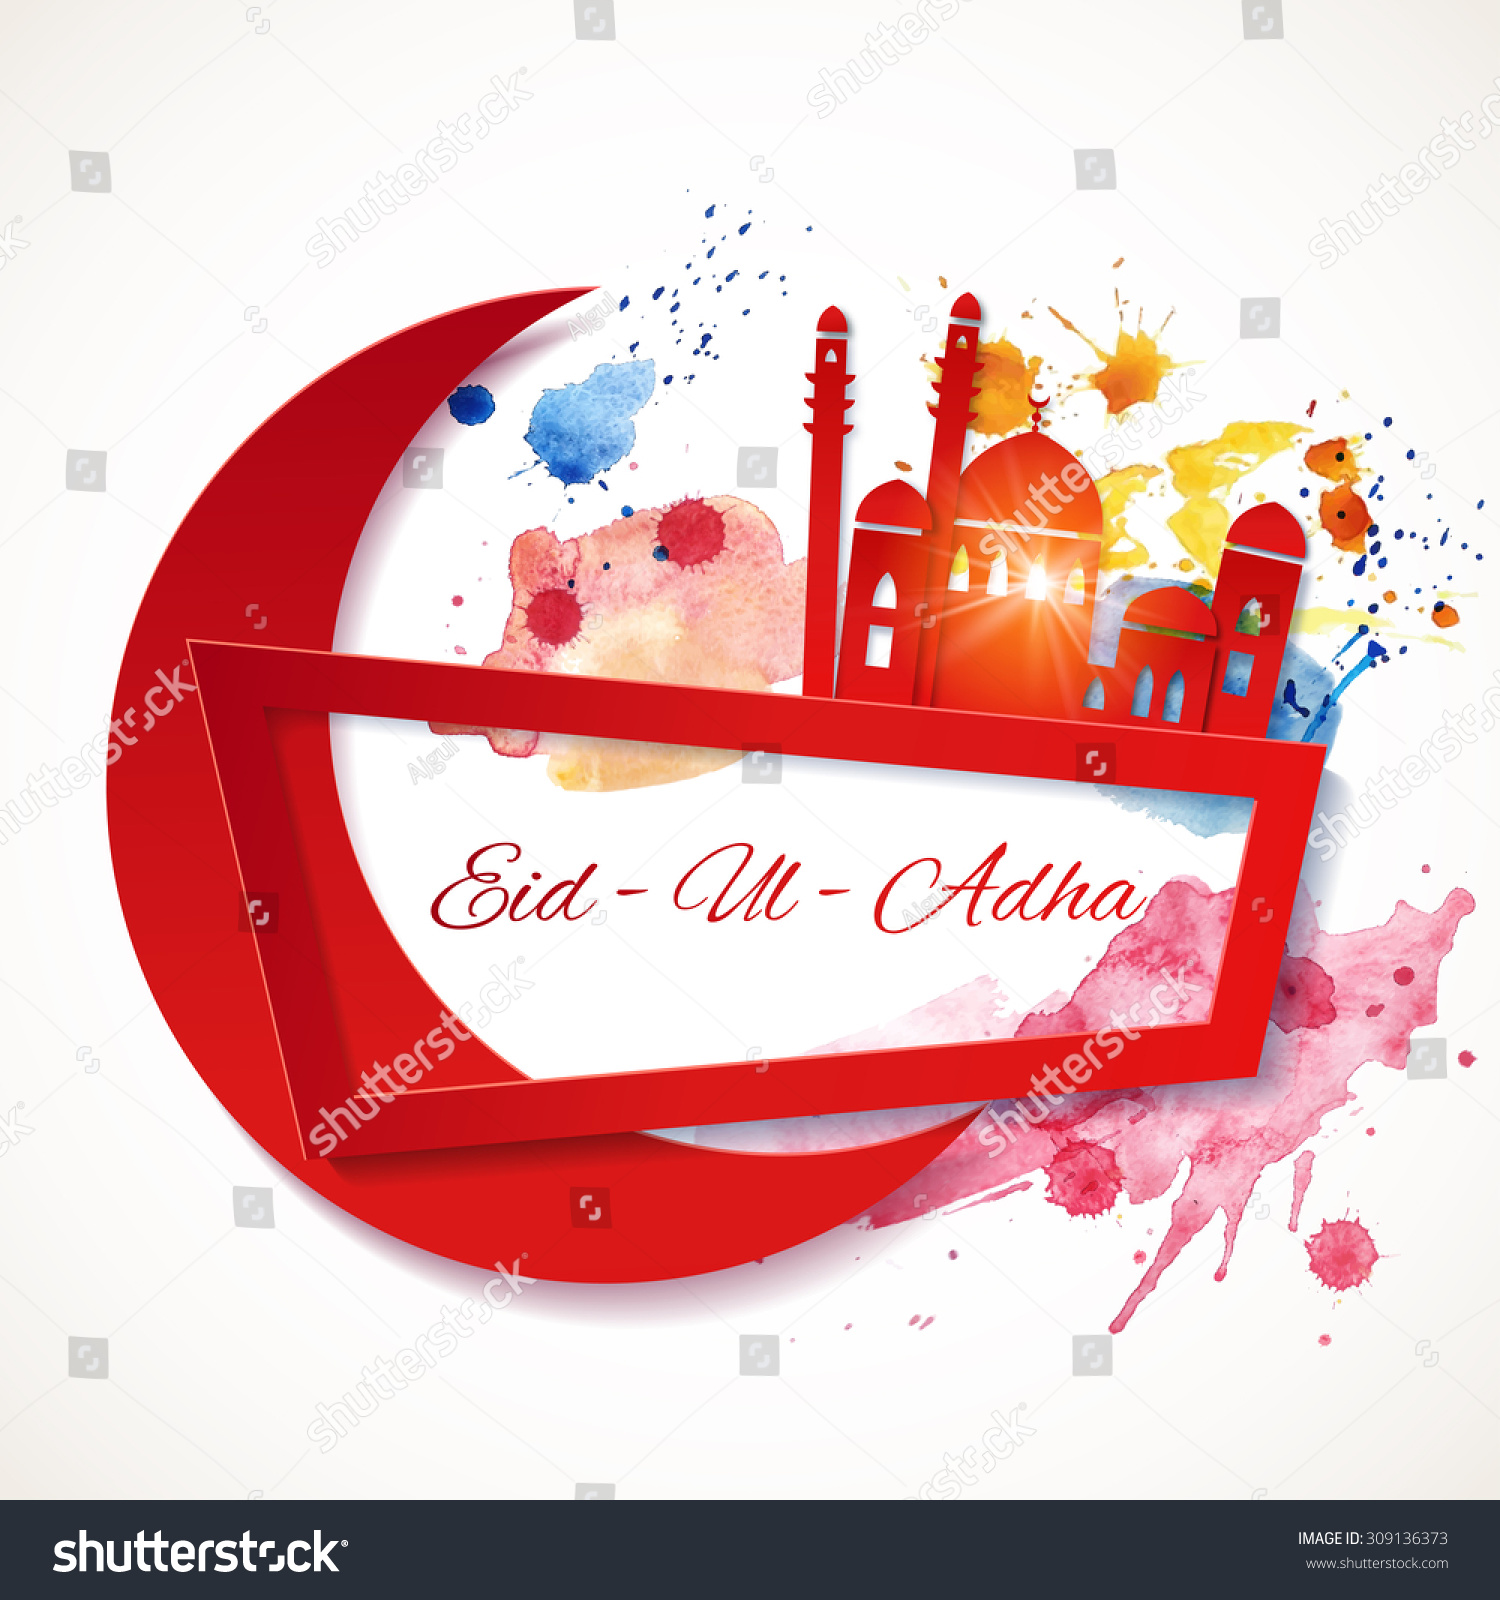 Eiduladha Banner Muslim Greetings Background Paper Stock Vector